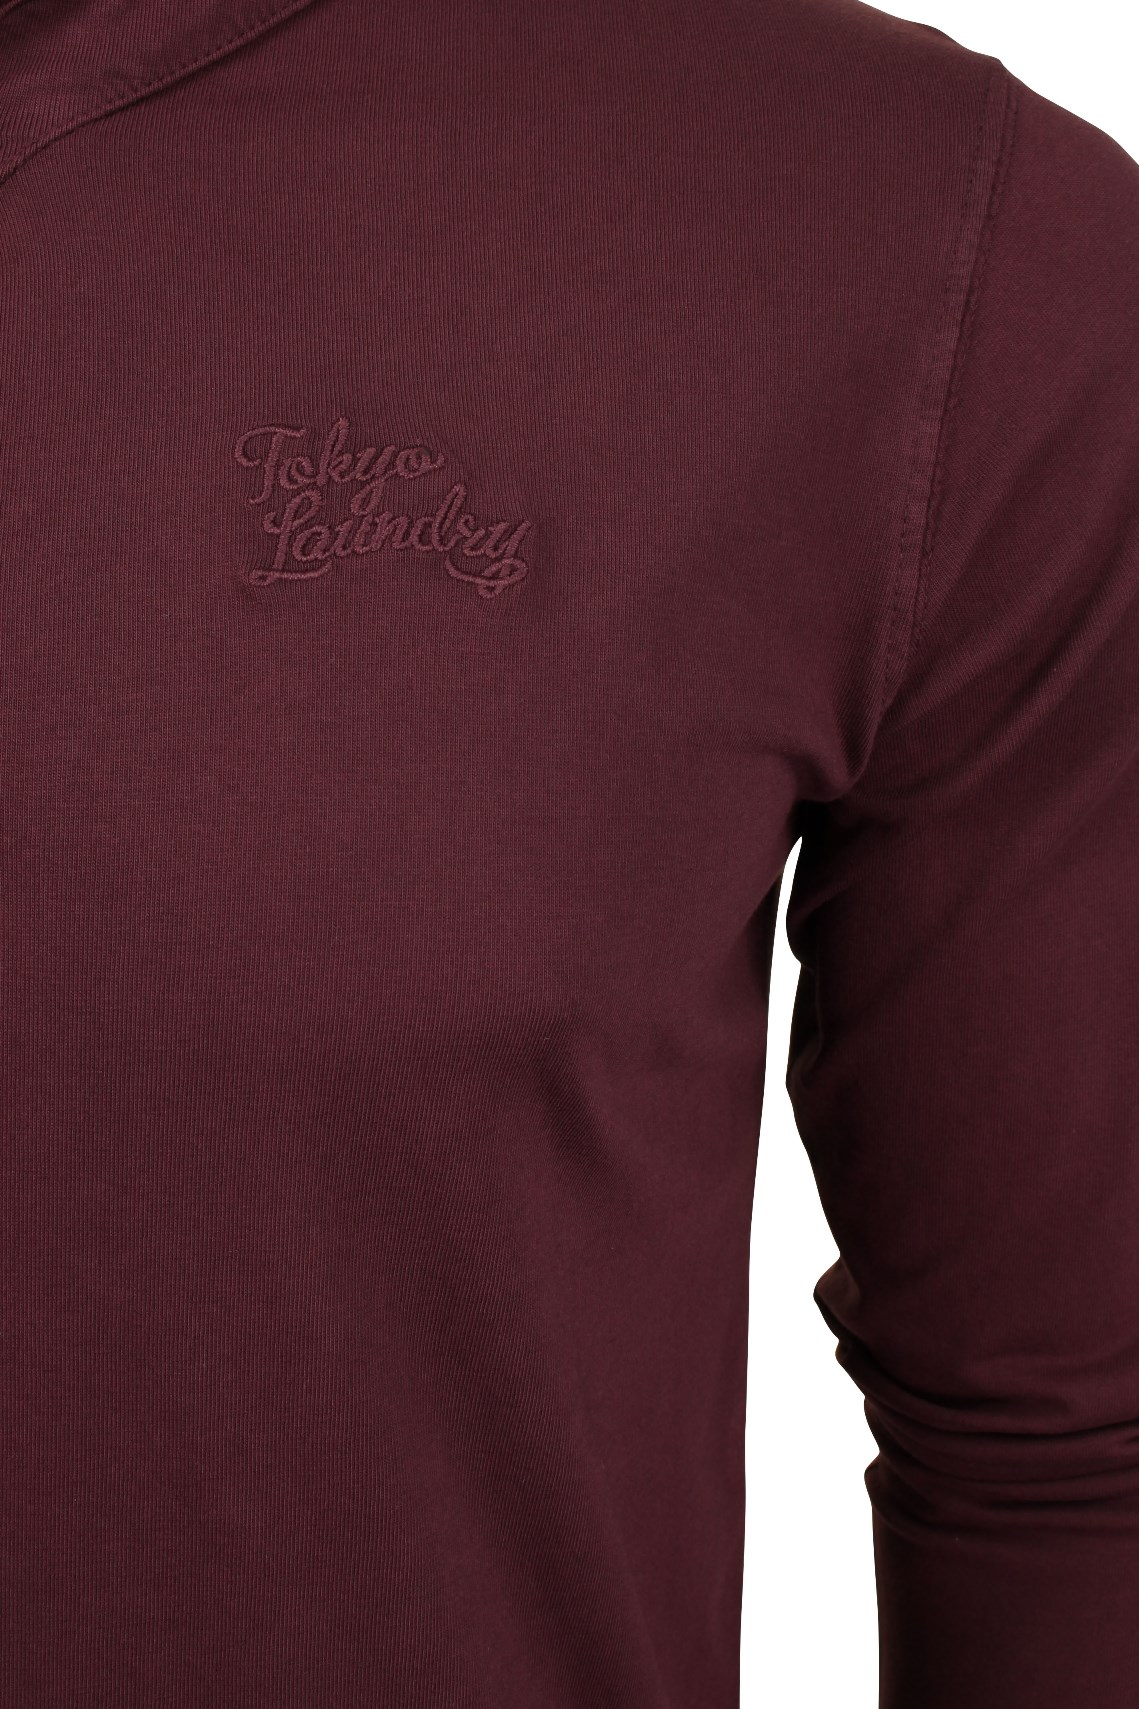 Mens-Grandad-T-Shirt-by-Tokyo-Laundry-039-Winter-Pines-039-Long-Sleeved thumbnail 10